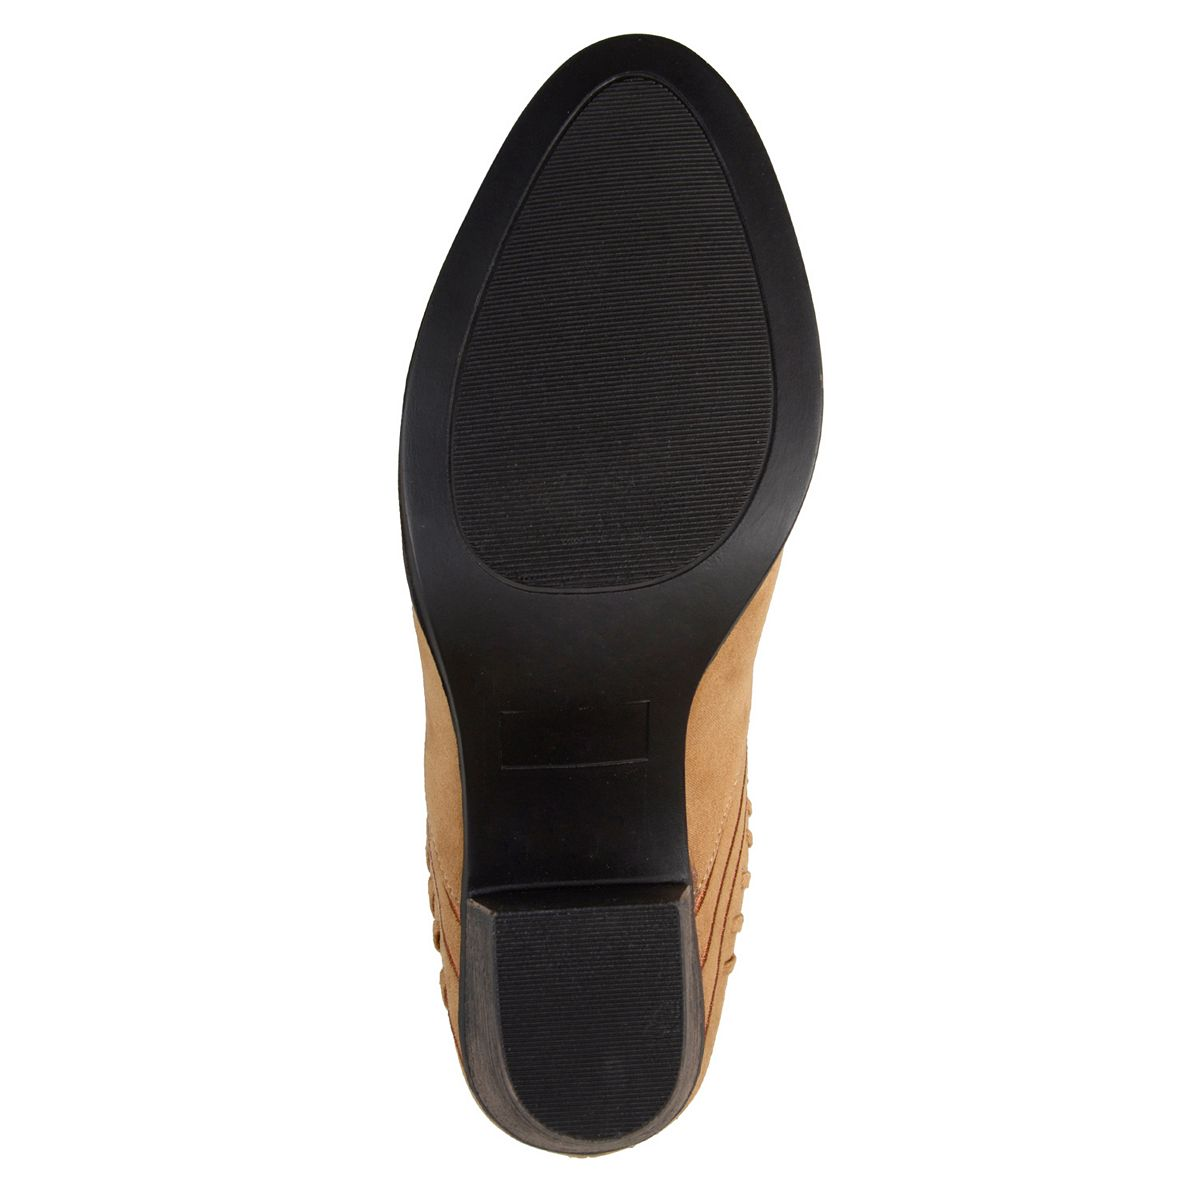 Journee Collection Gigi Women's Heeled Mules Taupe UIGOJ